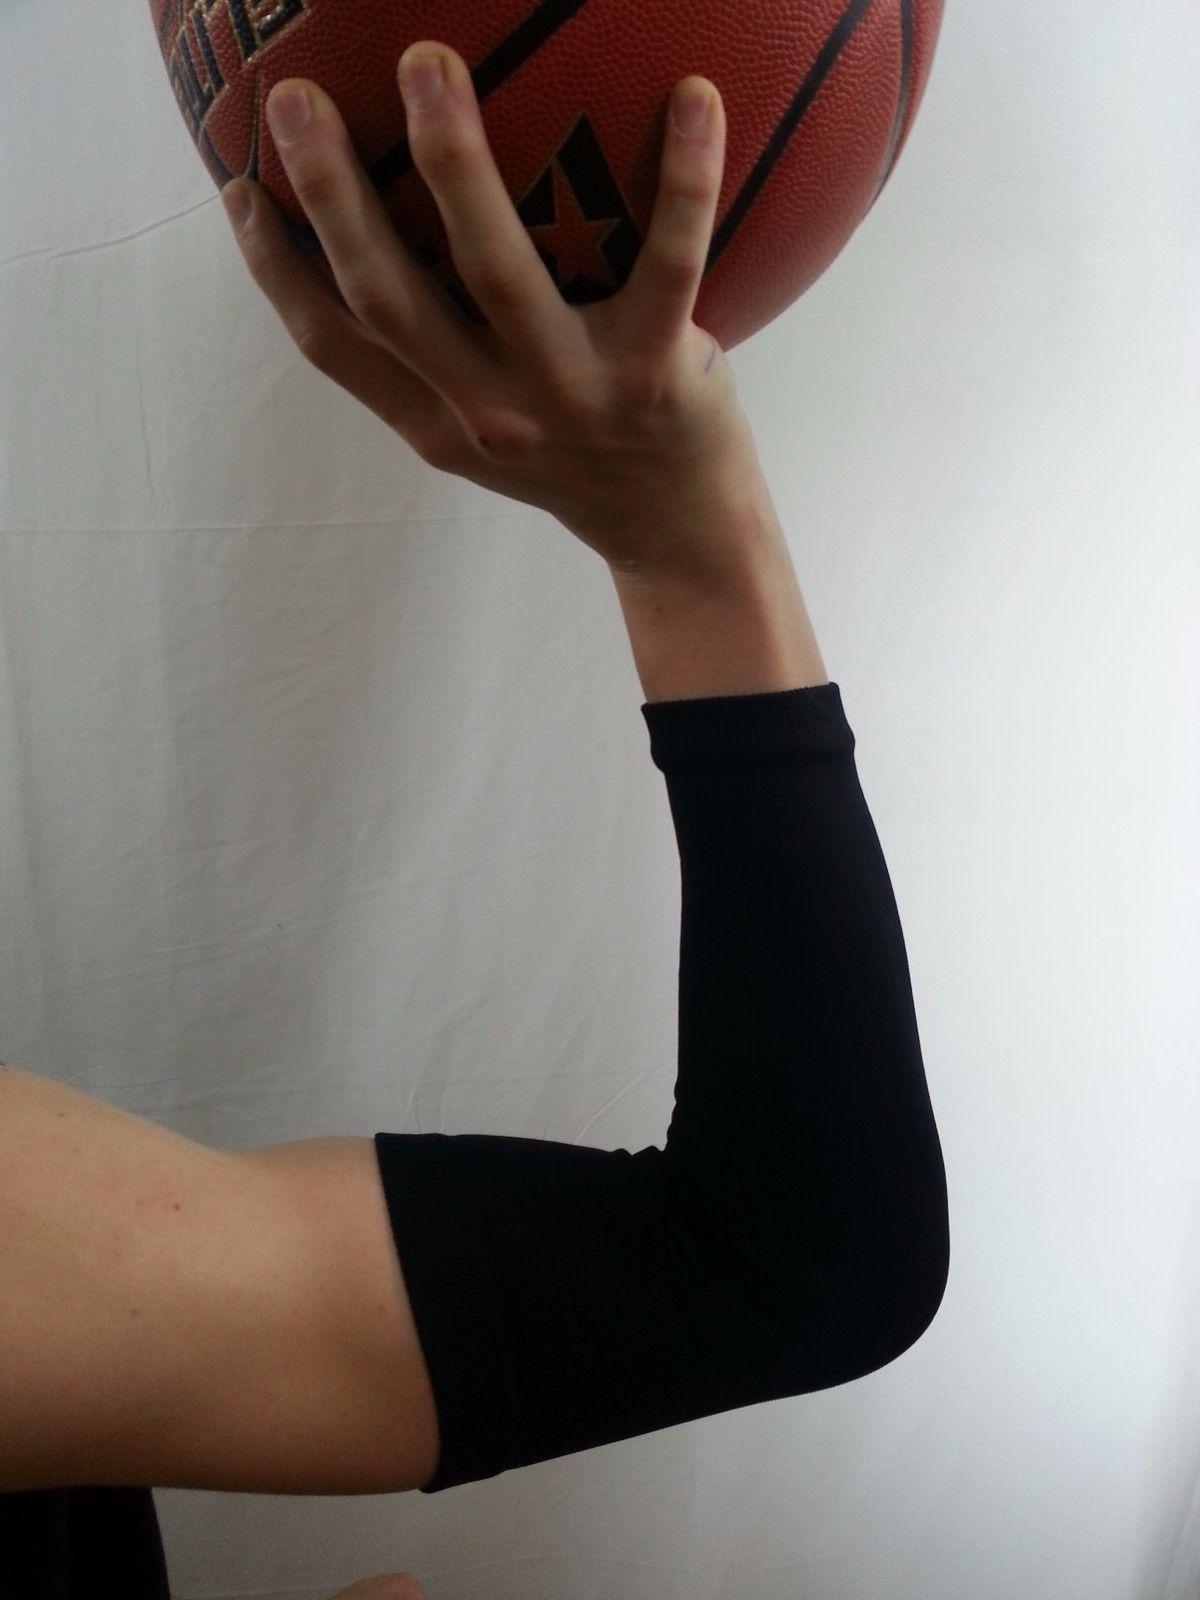 Baloncesto de disparo brazo de compresión manga Béisbol Fútbol Golf Deporte Estiramiento